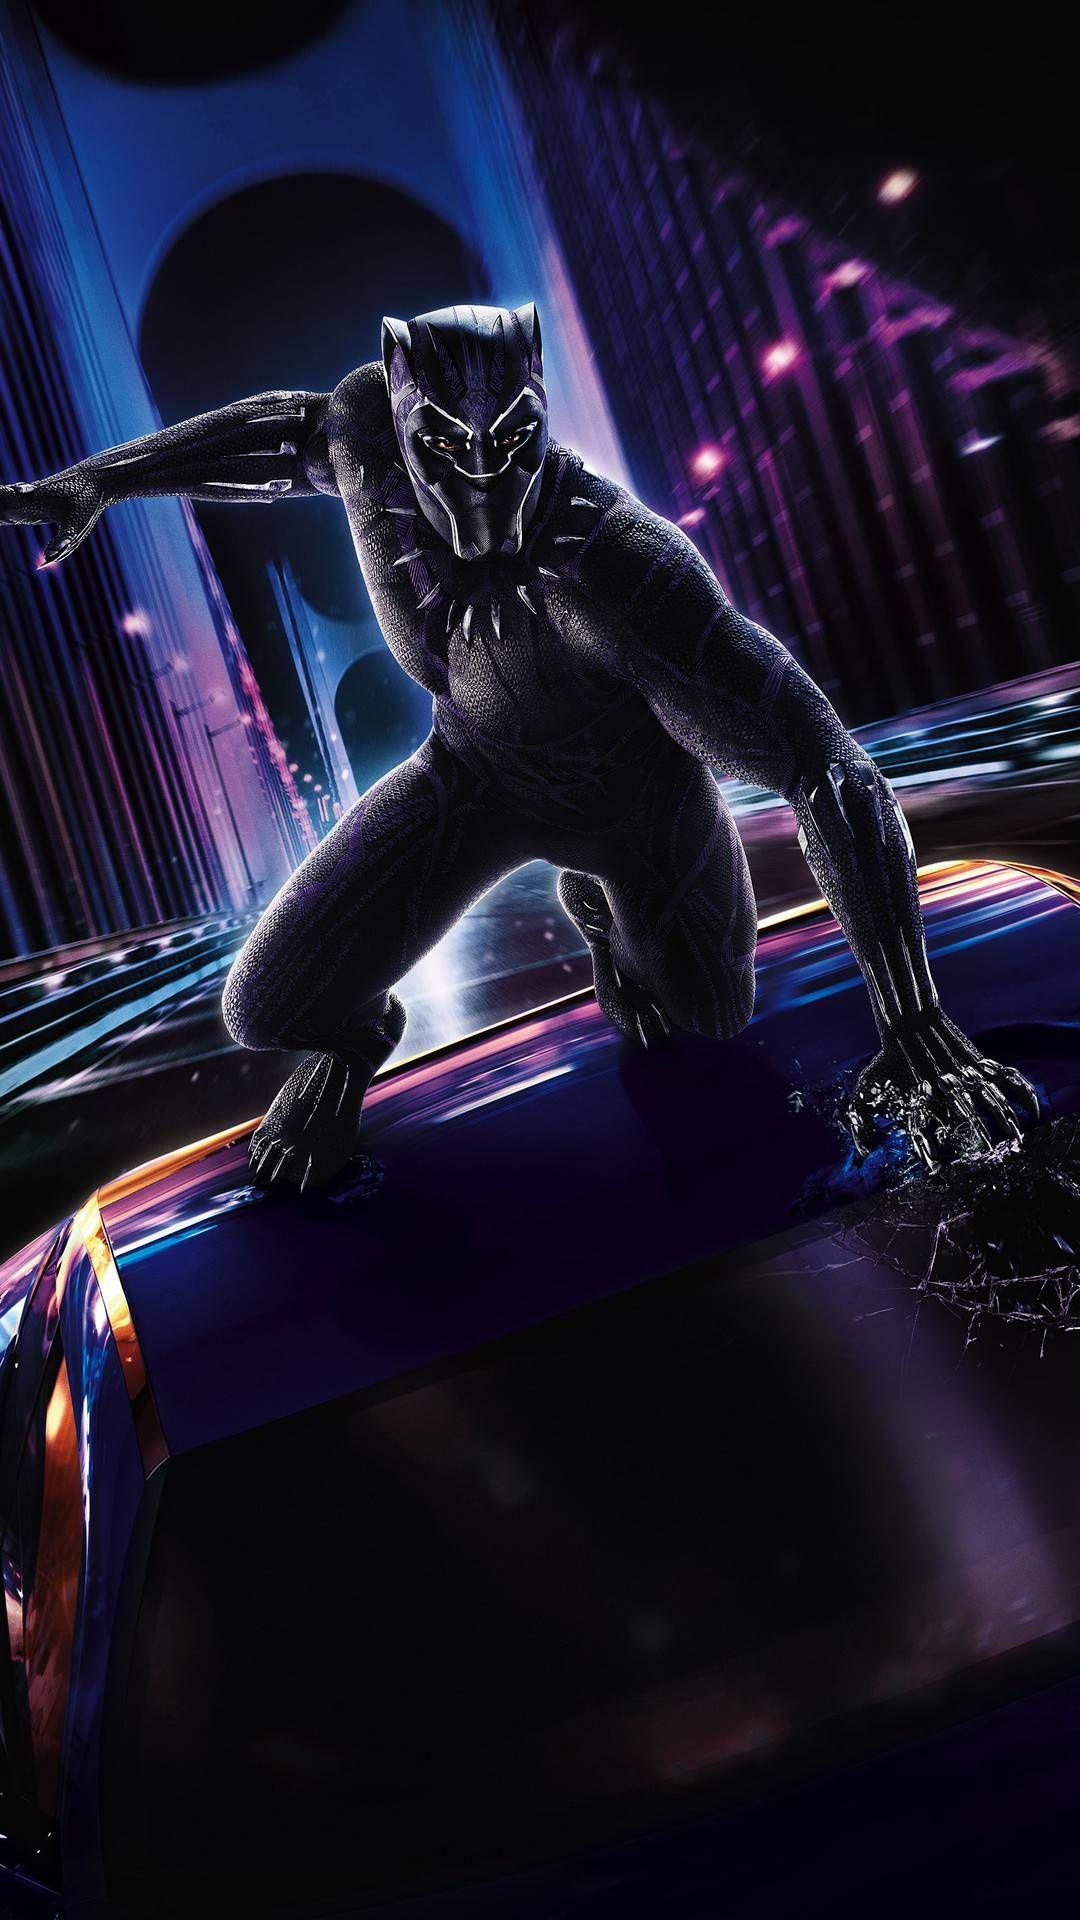 Marvel Black Panther Action Wallpaper Pantera negra